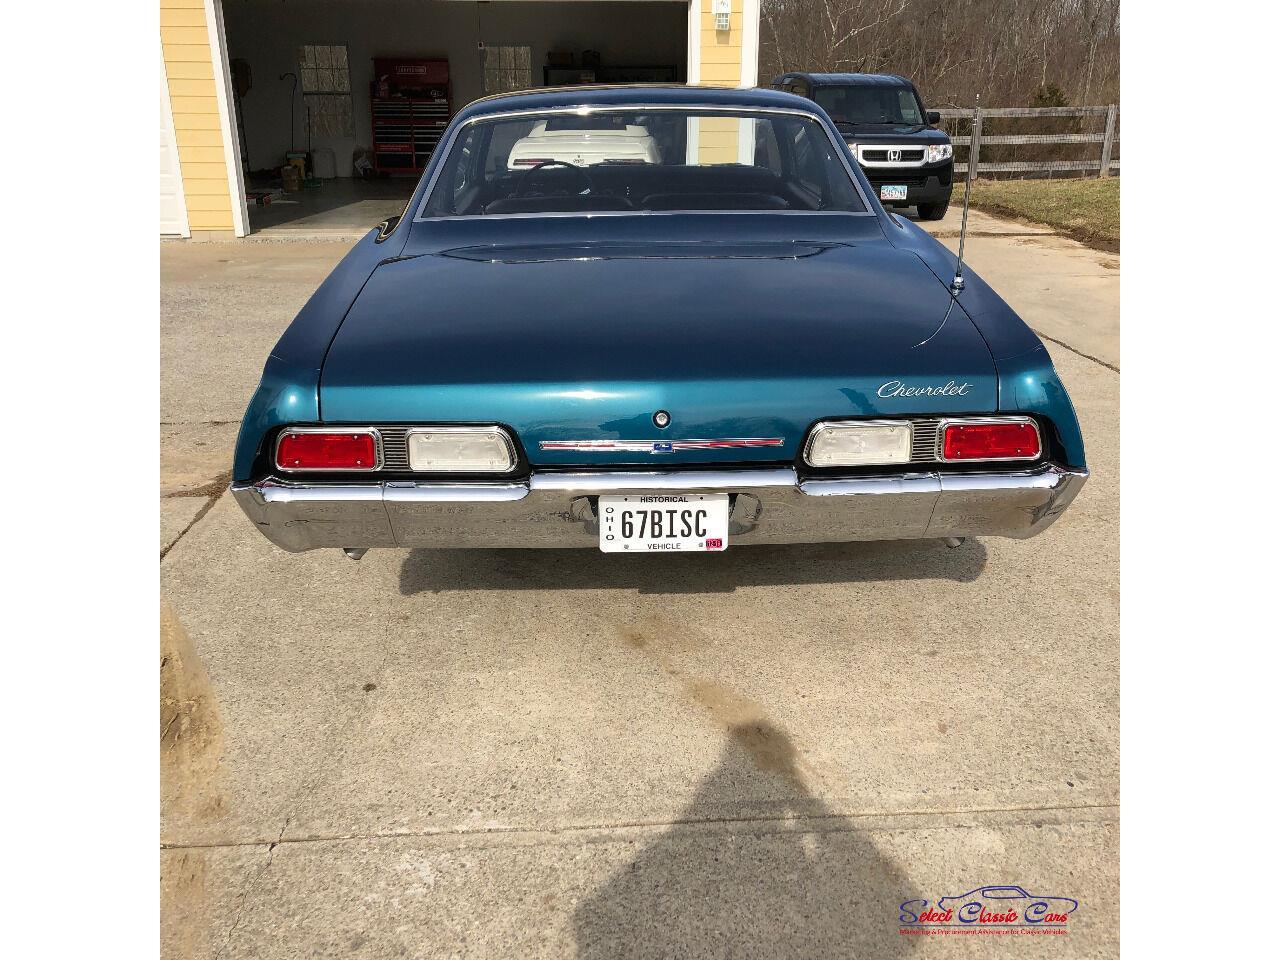 1967 Chevrolet Biscayne (CC-1300636) for sale in Hiram, Georgia